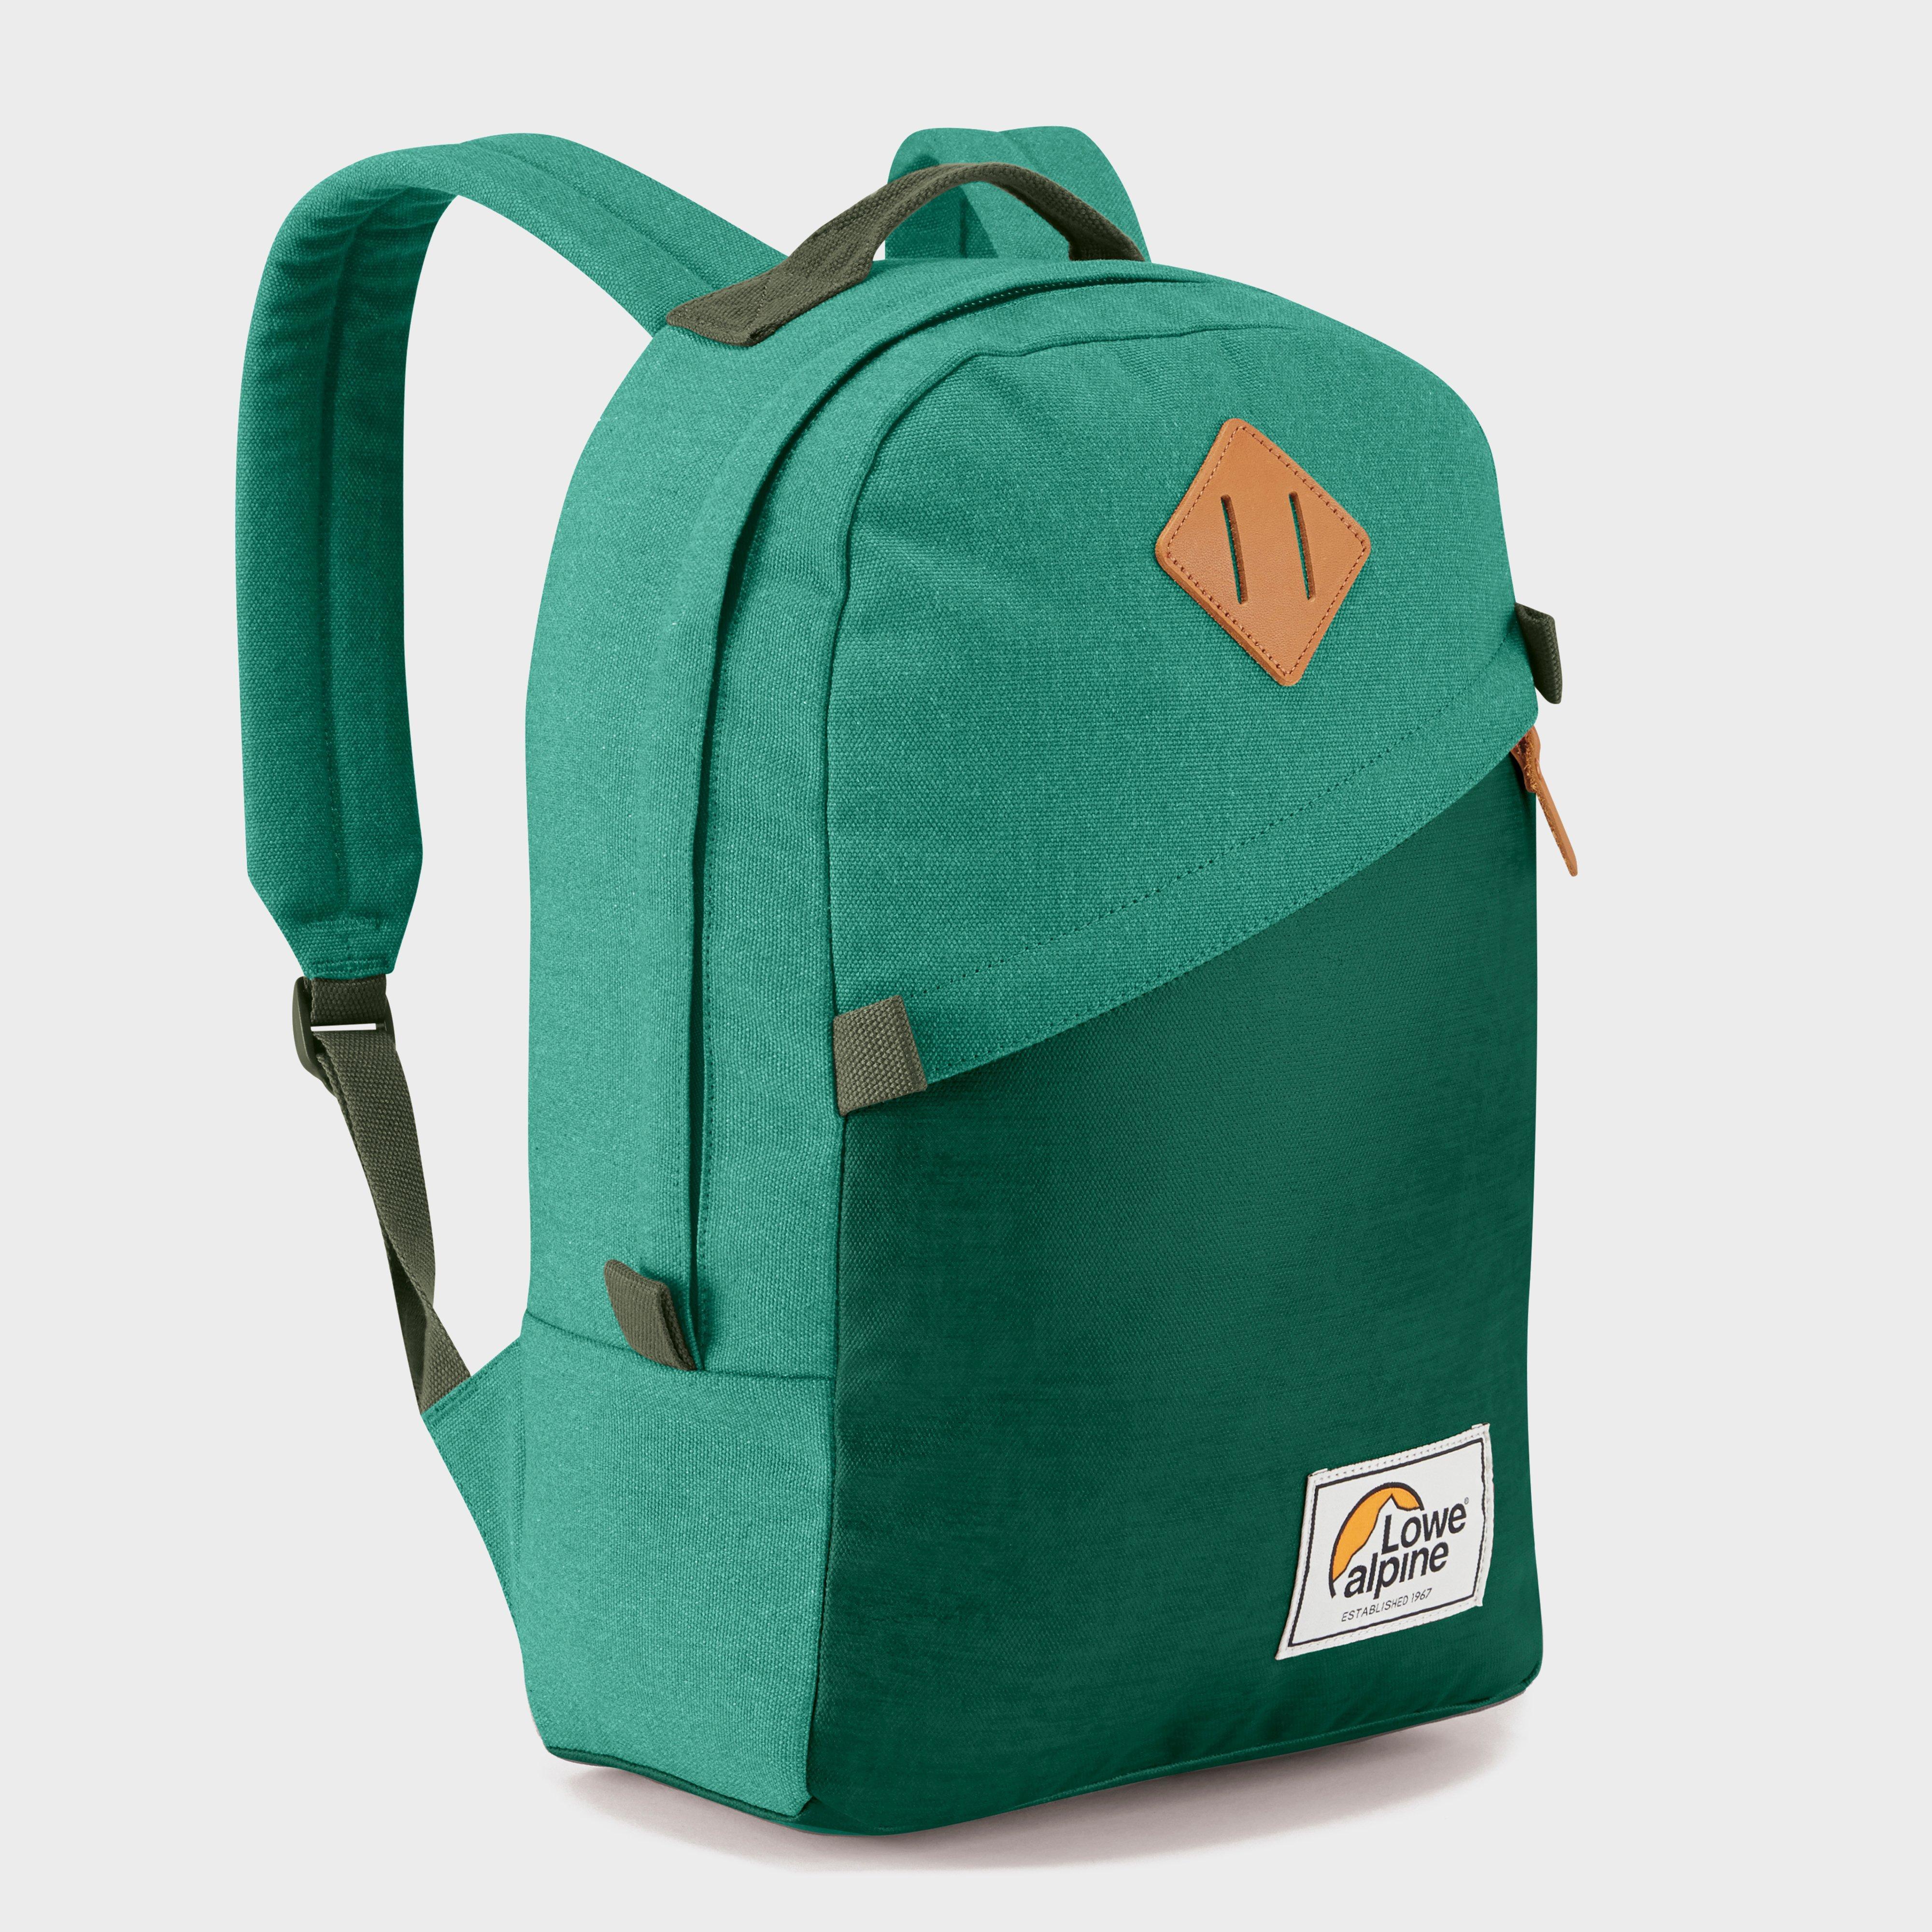 Lowe Alpine Adventurer 20 Backpack, Green